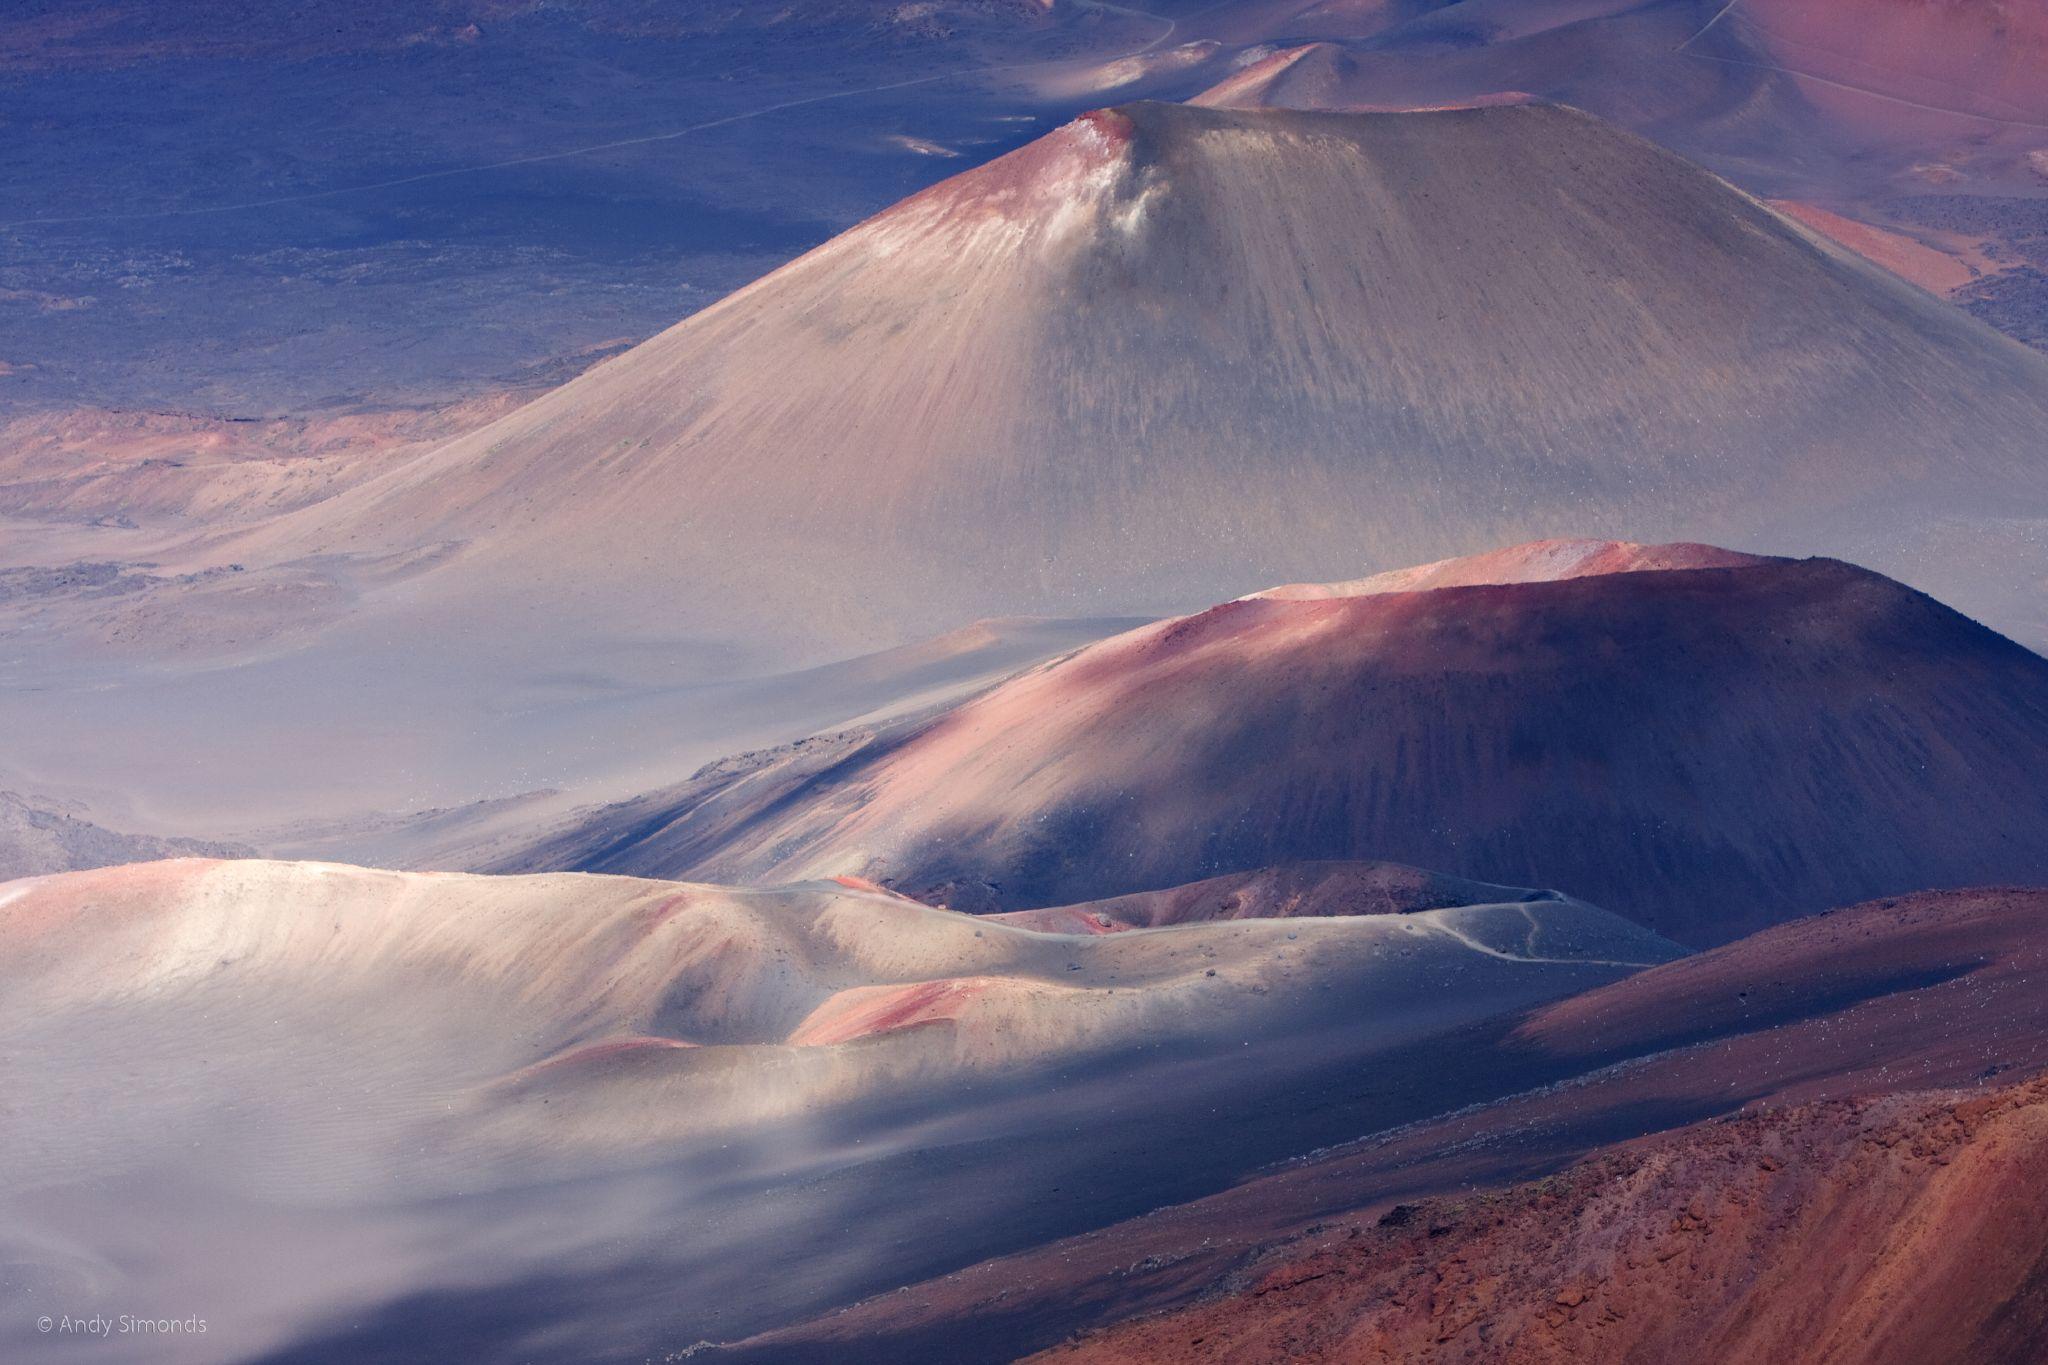 Sliding Sands Trail, Haleakala National Park